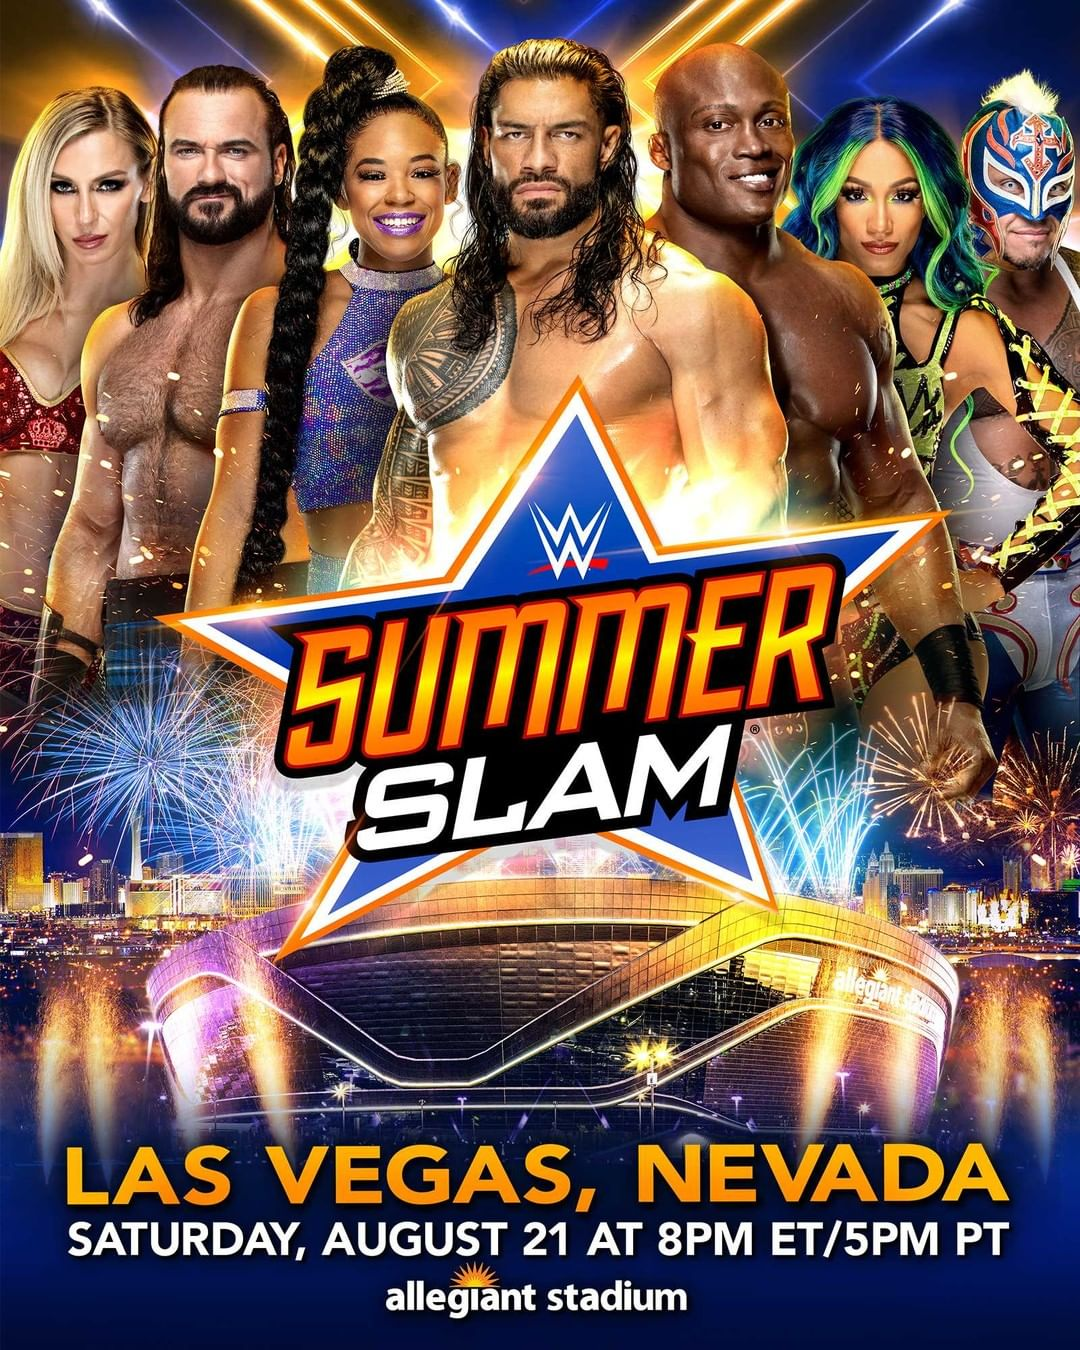 WWE Summerslam 2021: New Title Match Officially Announced 33